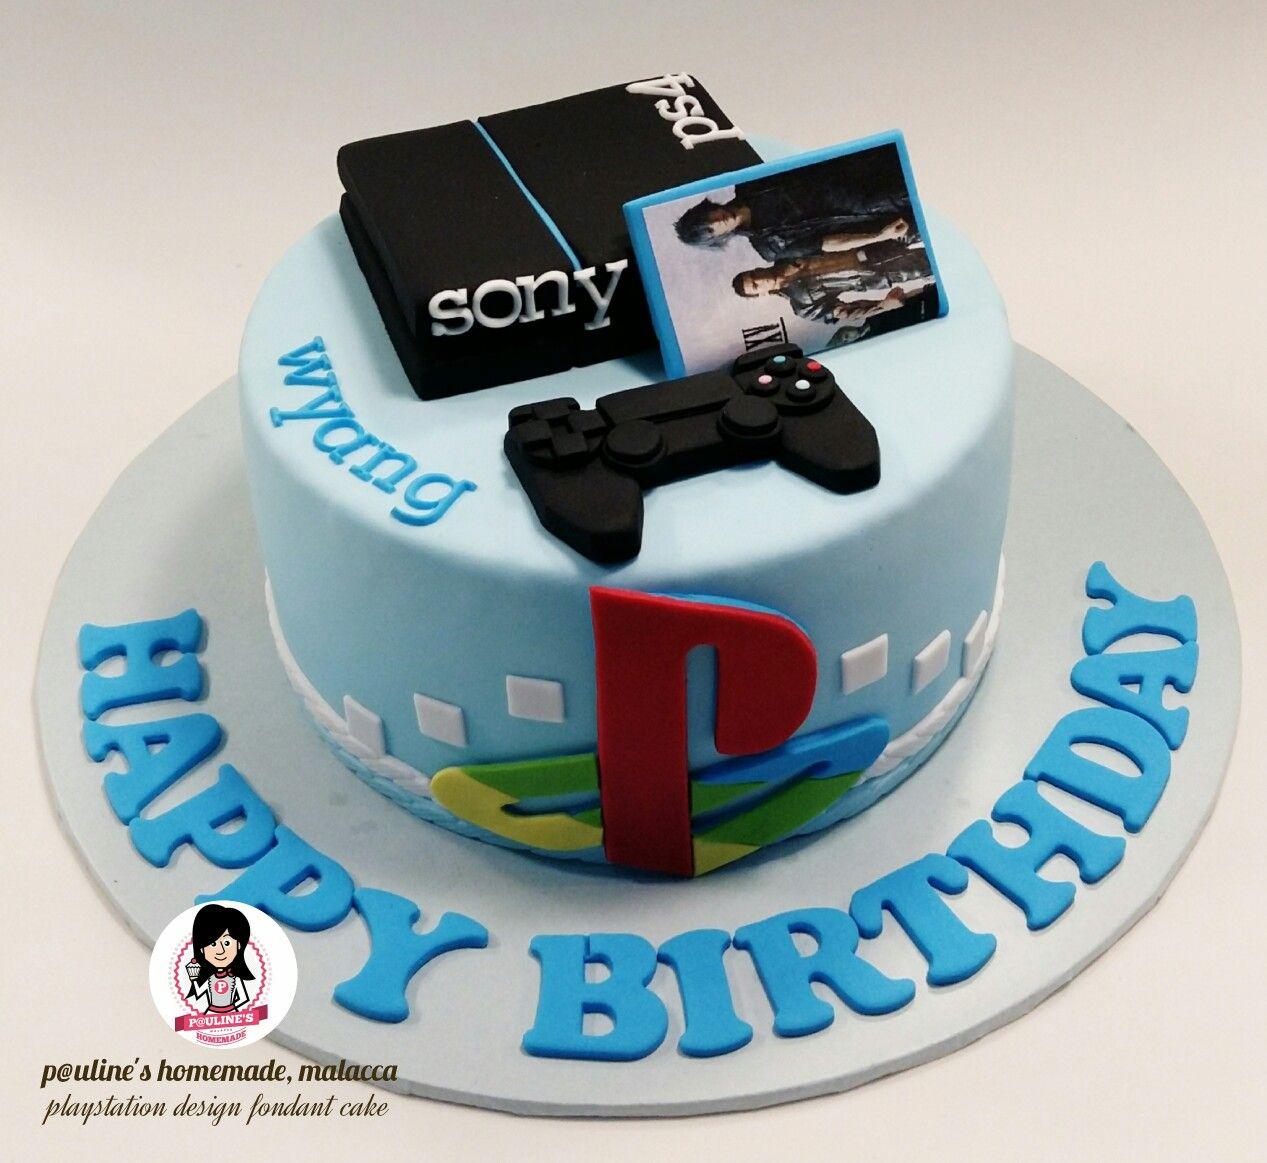 Playstation Design Fondant Cake Playstation Cake Cake Designs Birthday Ps4 Cake